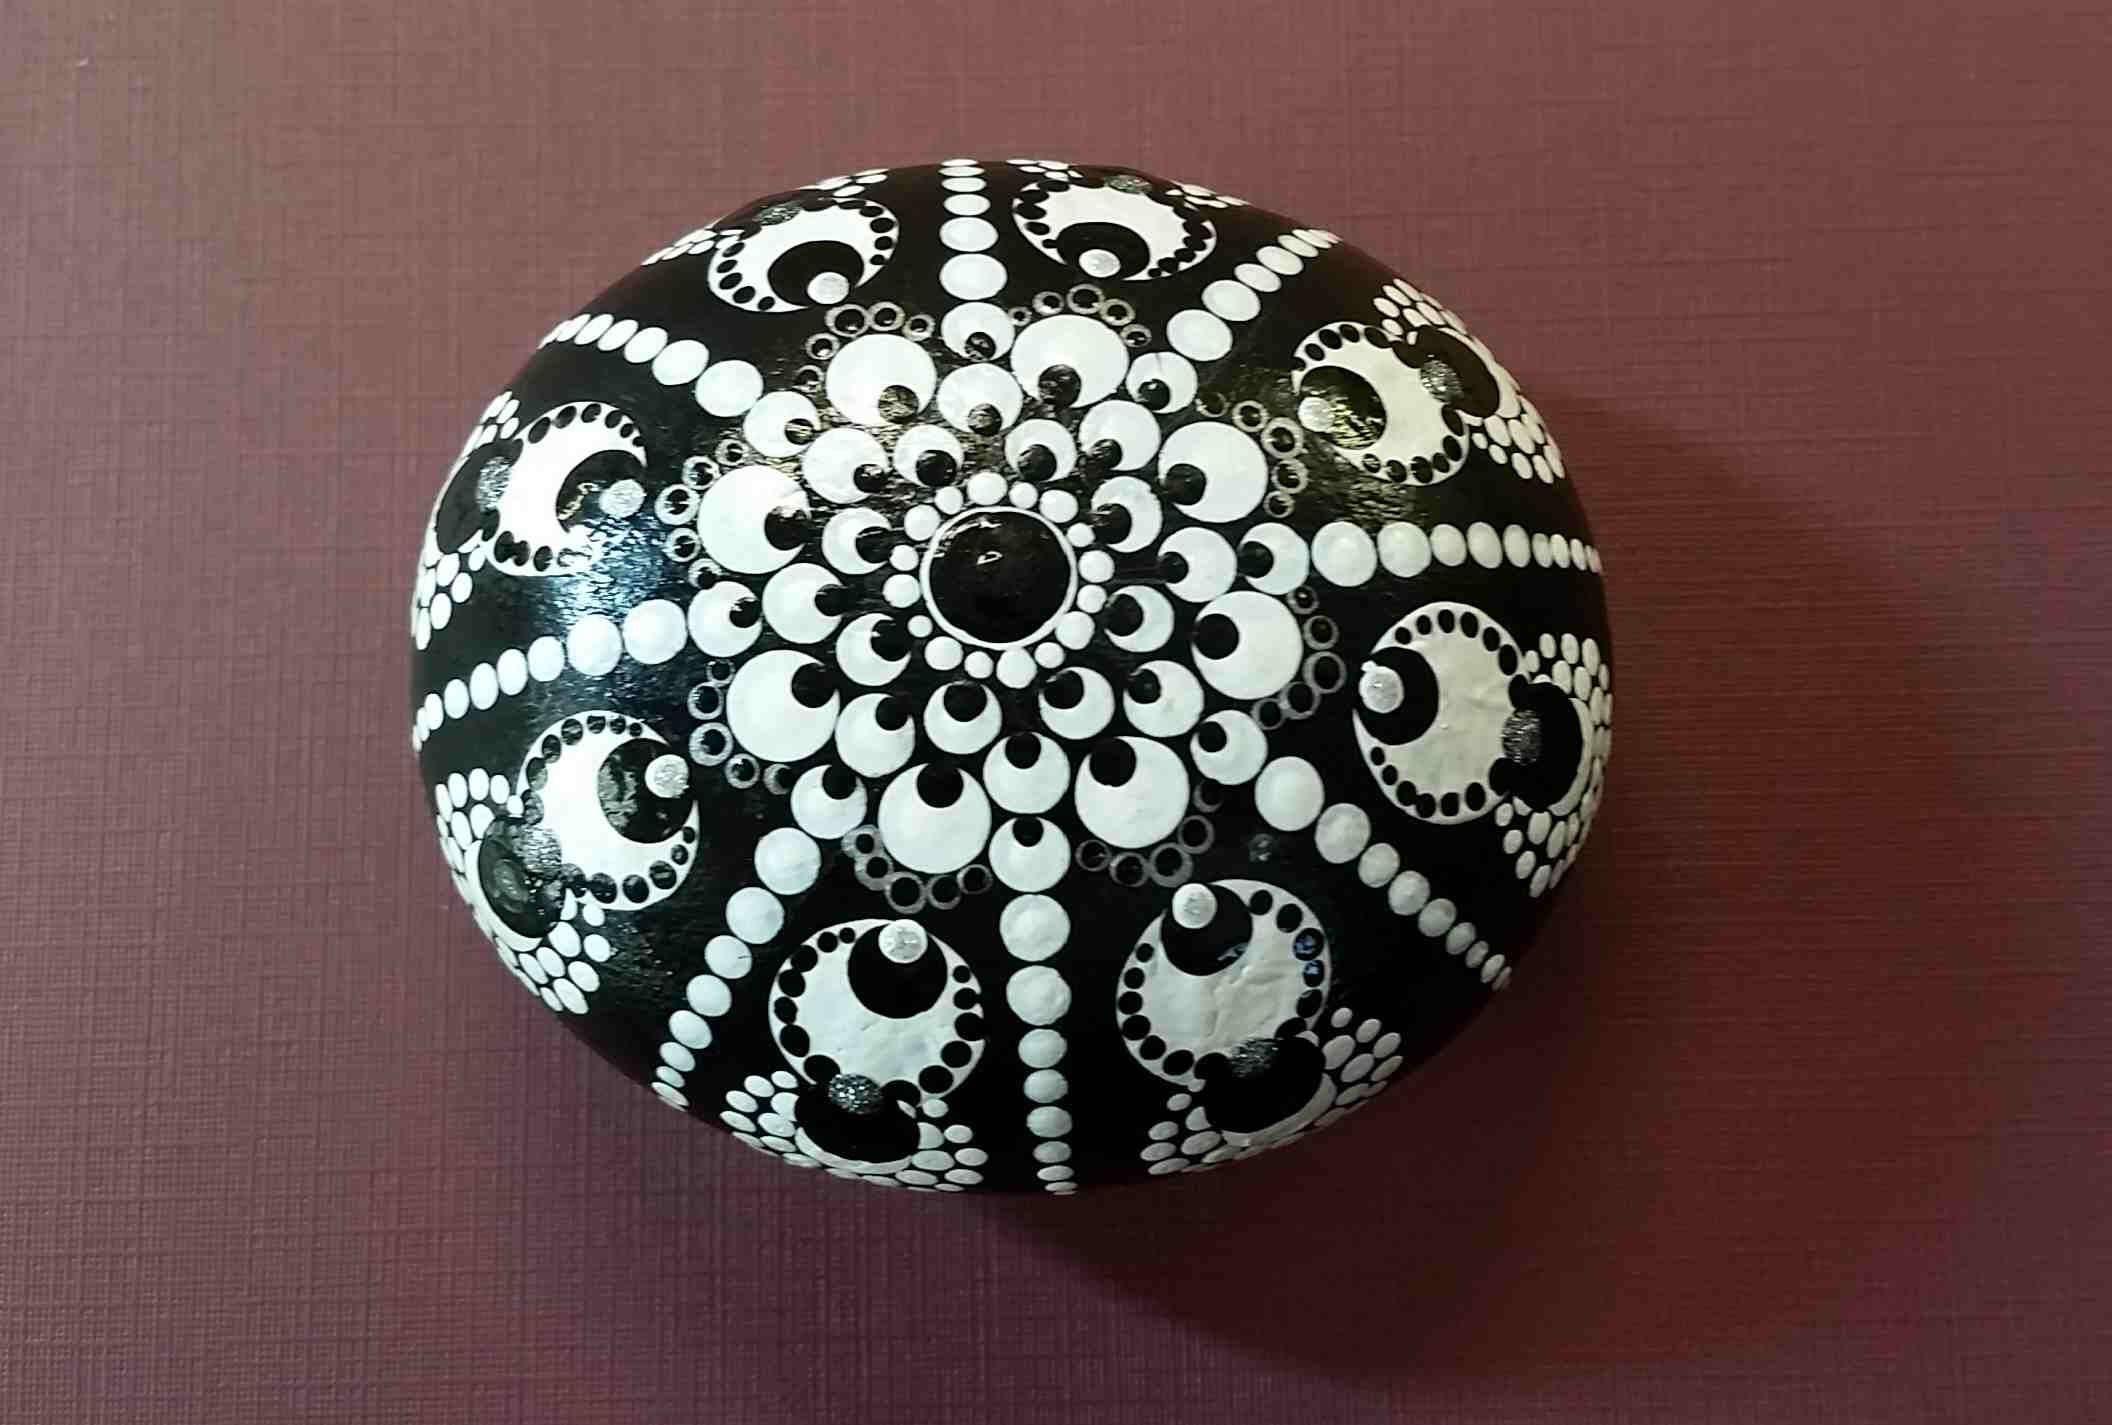 Black White Starburst Mandal By Stoneinfinity On Etsy Https Www Etsy Com Listing 577083385 Black White S Steine Bemalen Mandala Steine Mandala Selber Malen